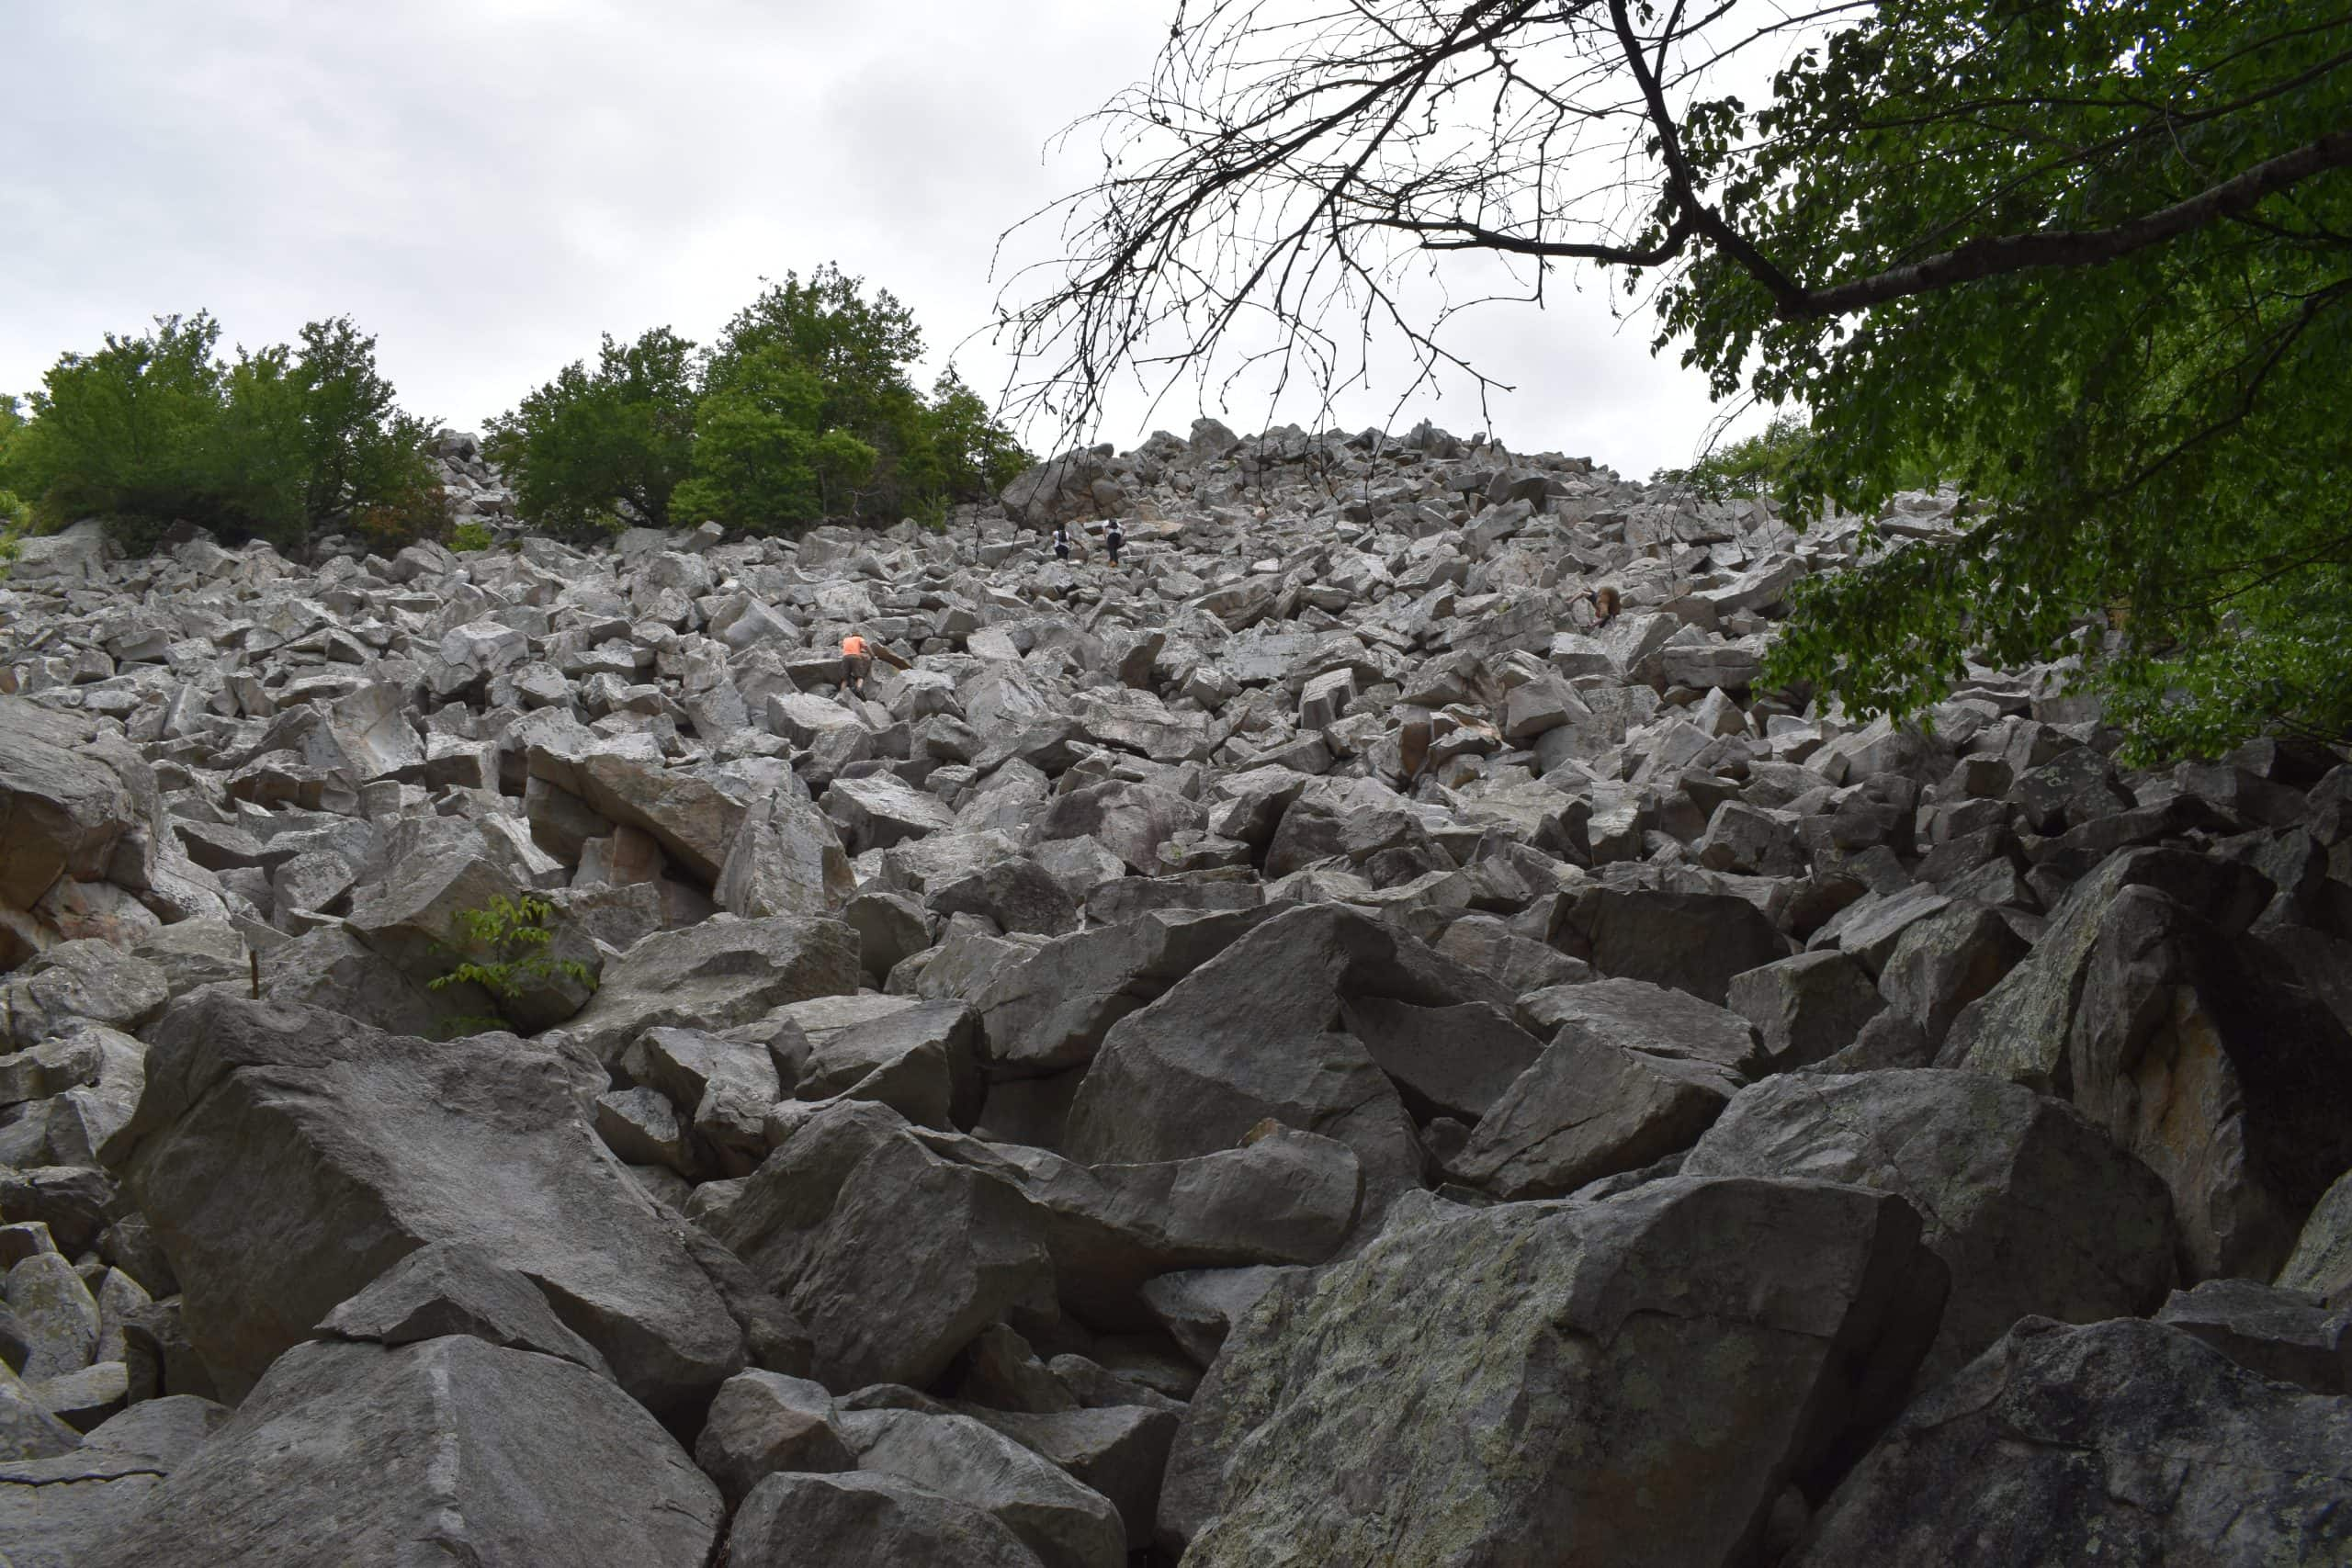 Best Hikes Near Roanoke Va